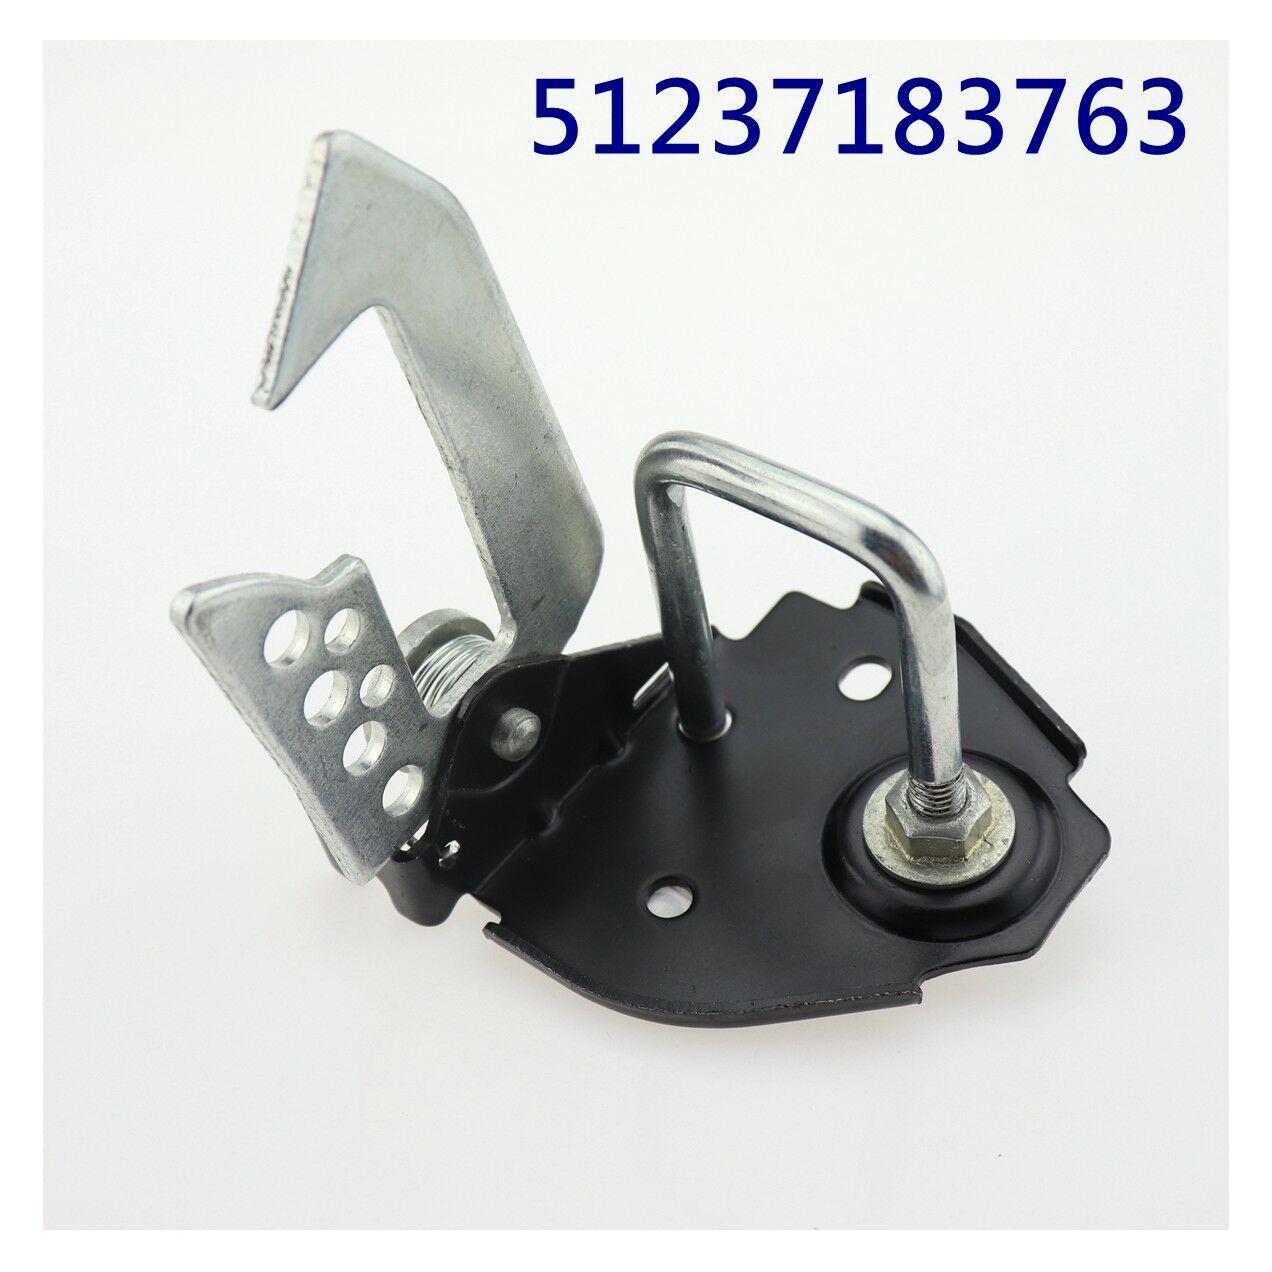 For 09-16 BMW 528 535 550 650 740 750 M5 M6 Z4 Hood Lock Latch RIGHT 51237183764